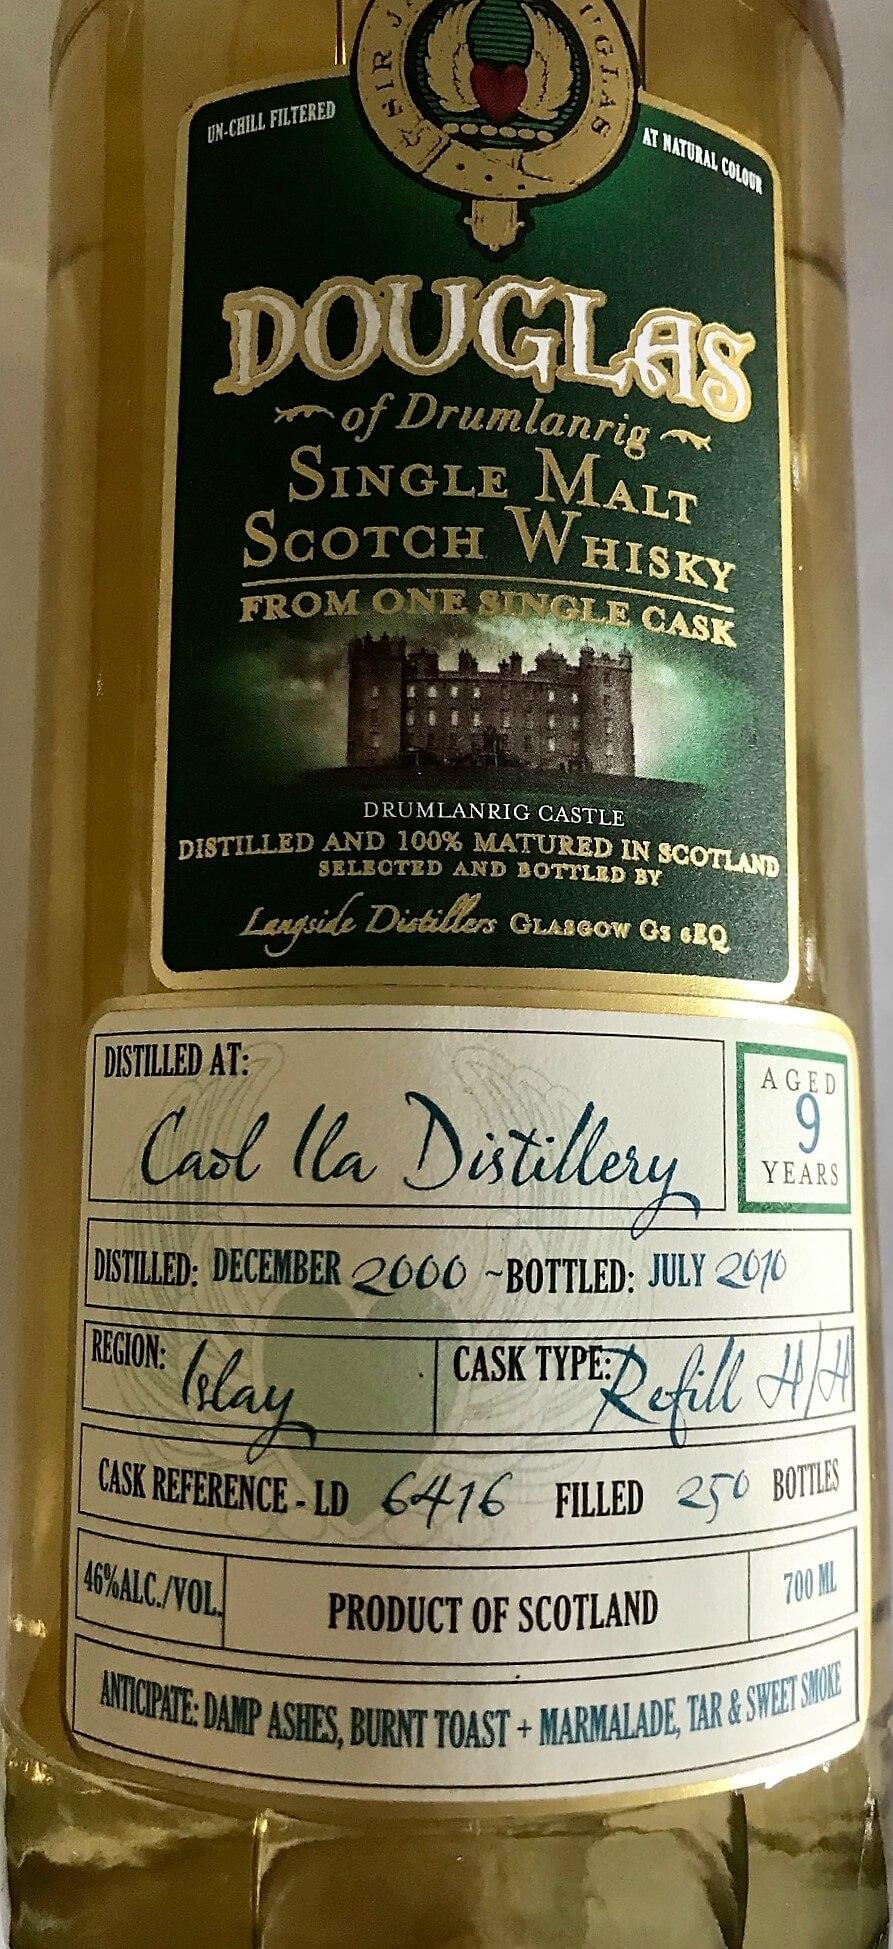 Douglas Single Malt Scotch Whisky, Caol Ila Distillery, Islay